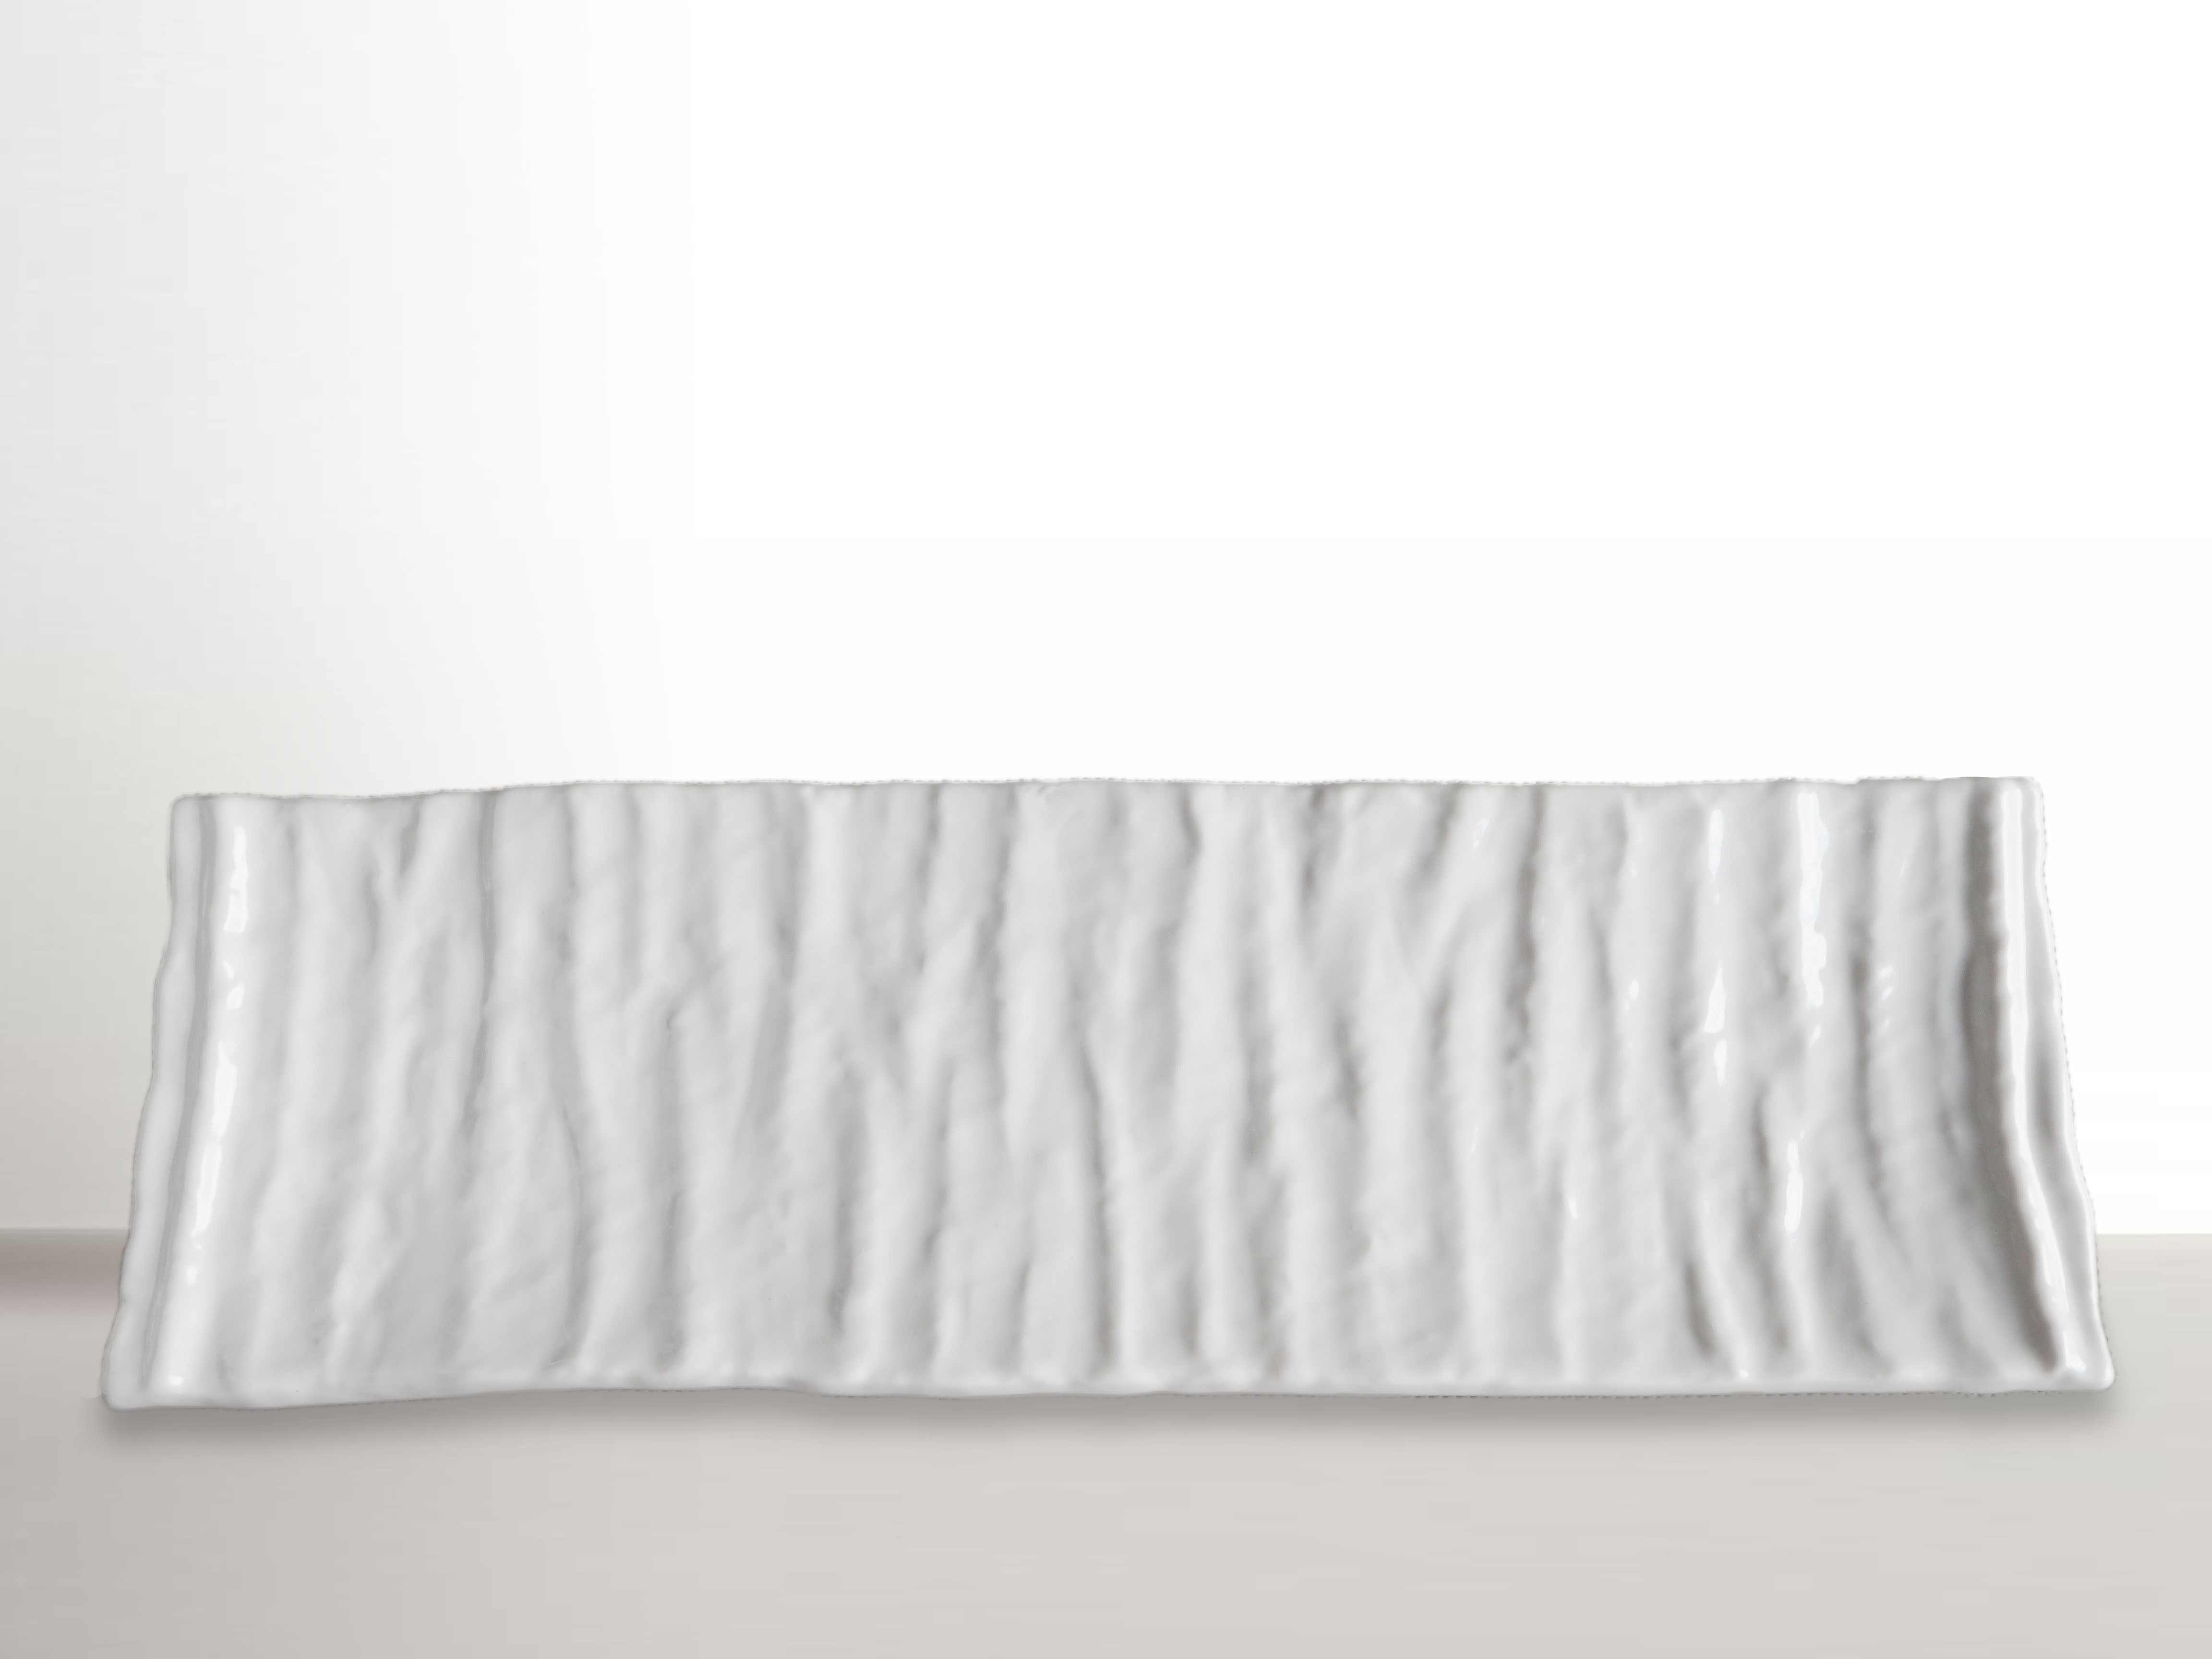 MIJ Hranatý talíř na sushi Crumpled bílý 33 x 11 cm